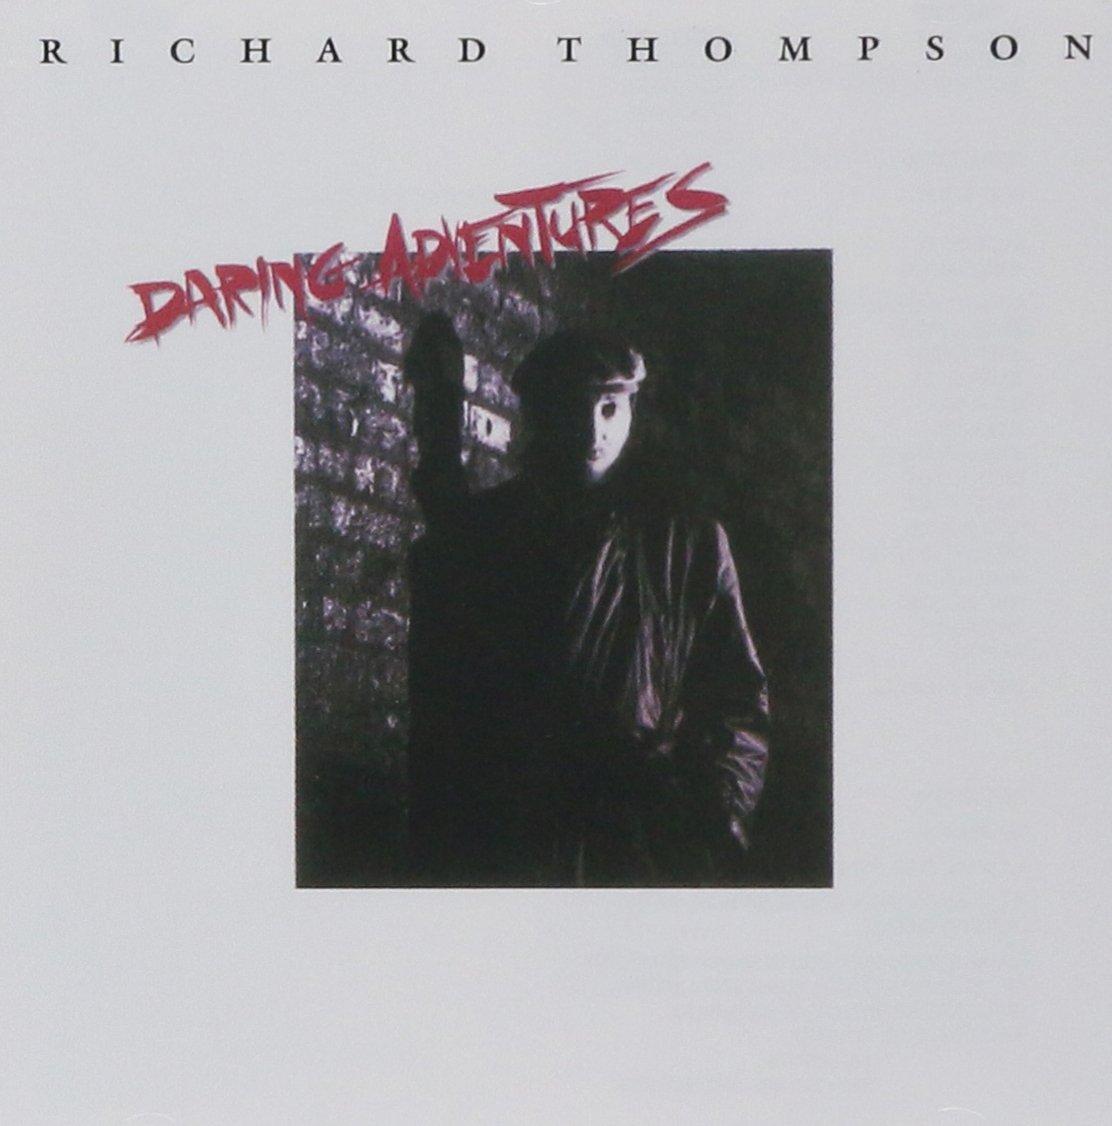 Daring Adventures - Richard Thompson